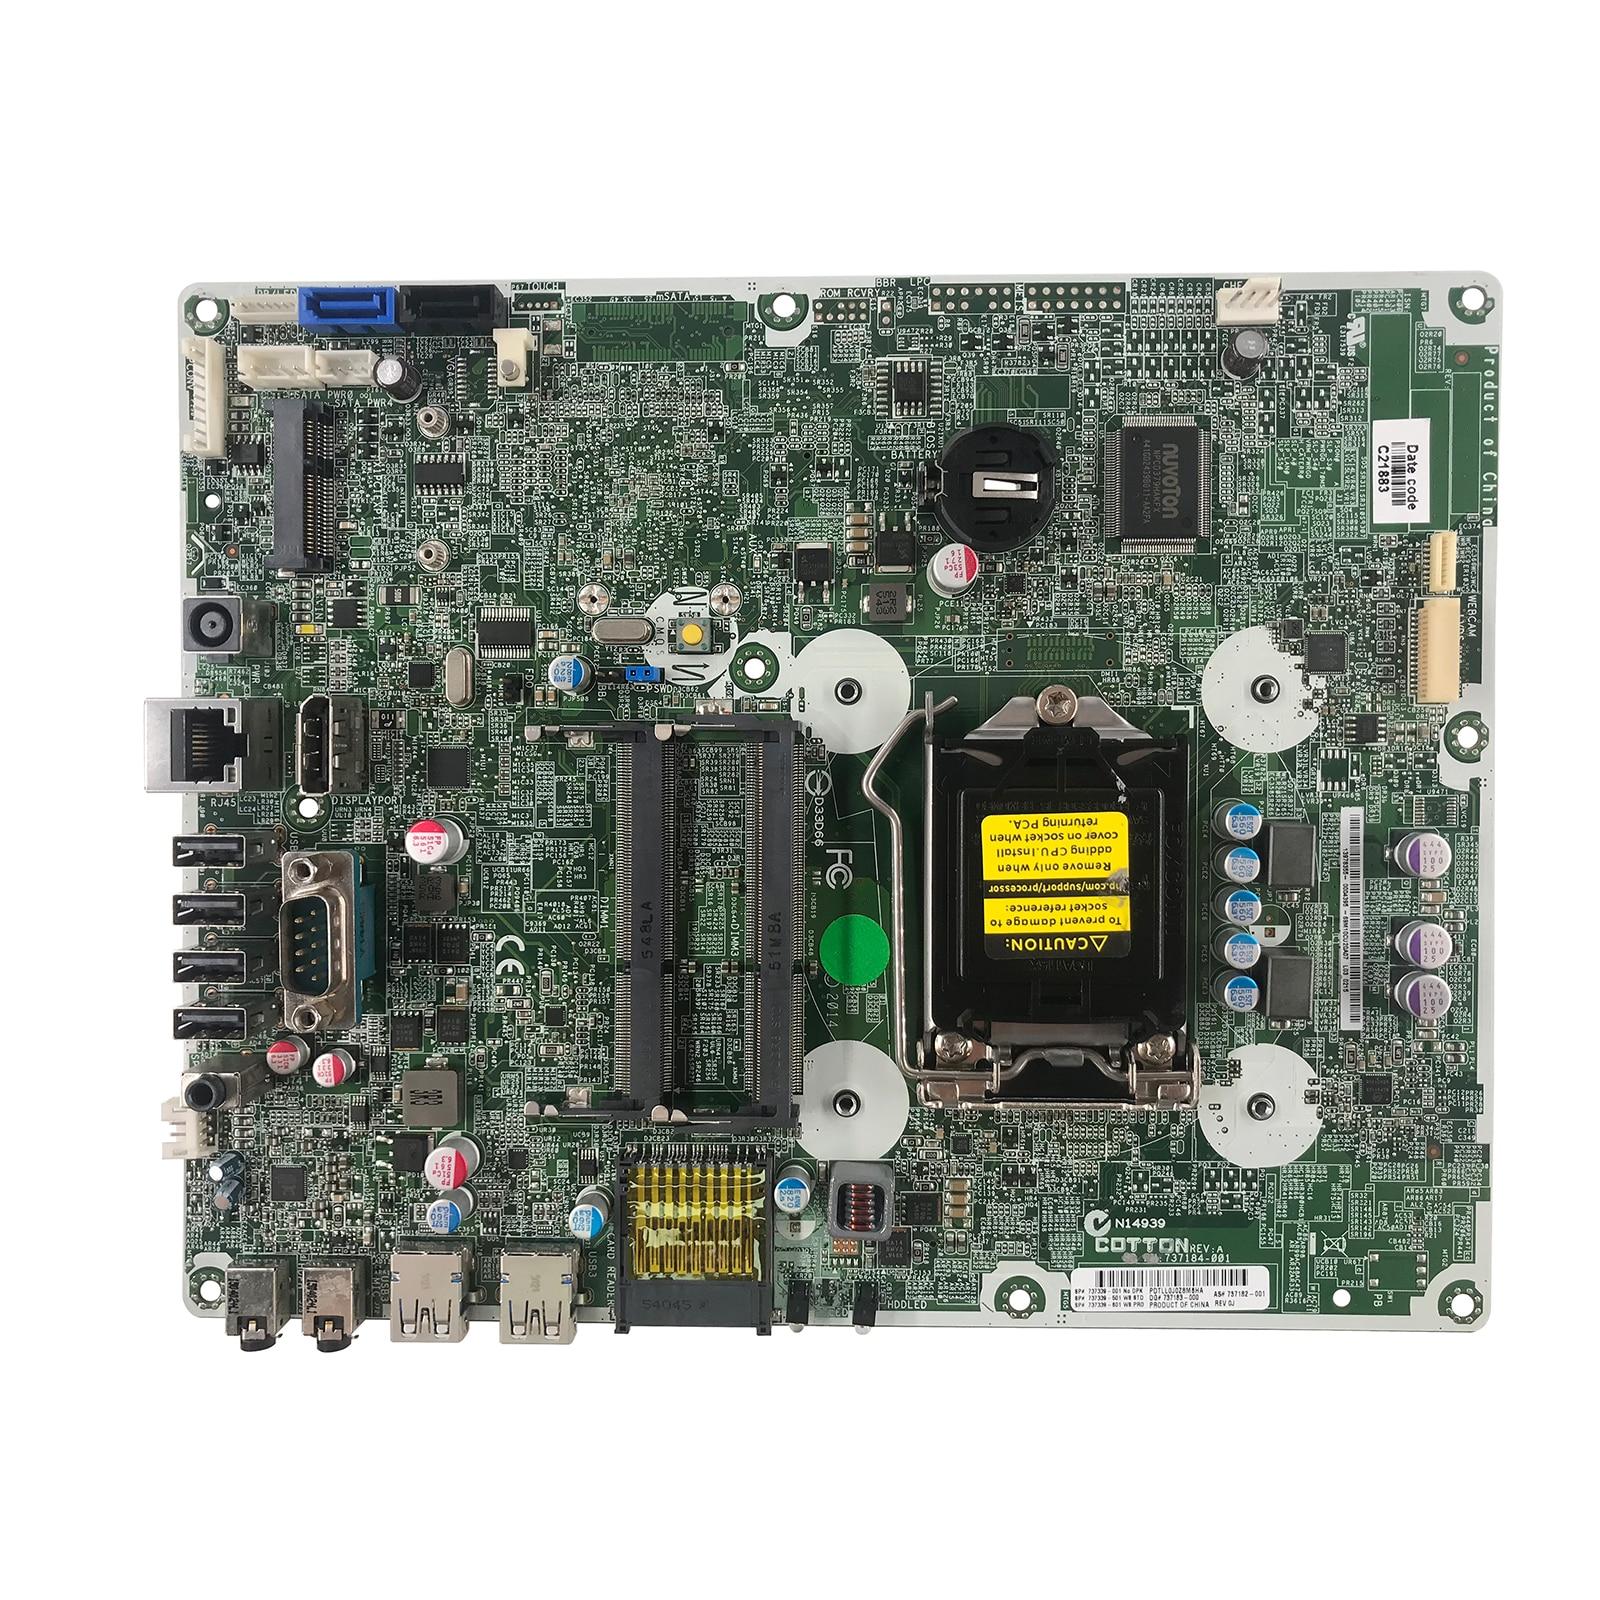 LSC ل HP برو واحد 400 G1 AIO اللوحة 737185-001 737340-001 737340-601 H81 LGA 1150 DDR3 100% Teste